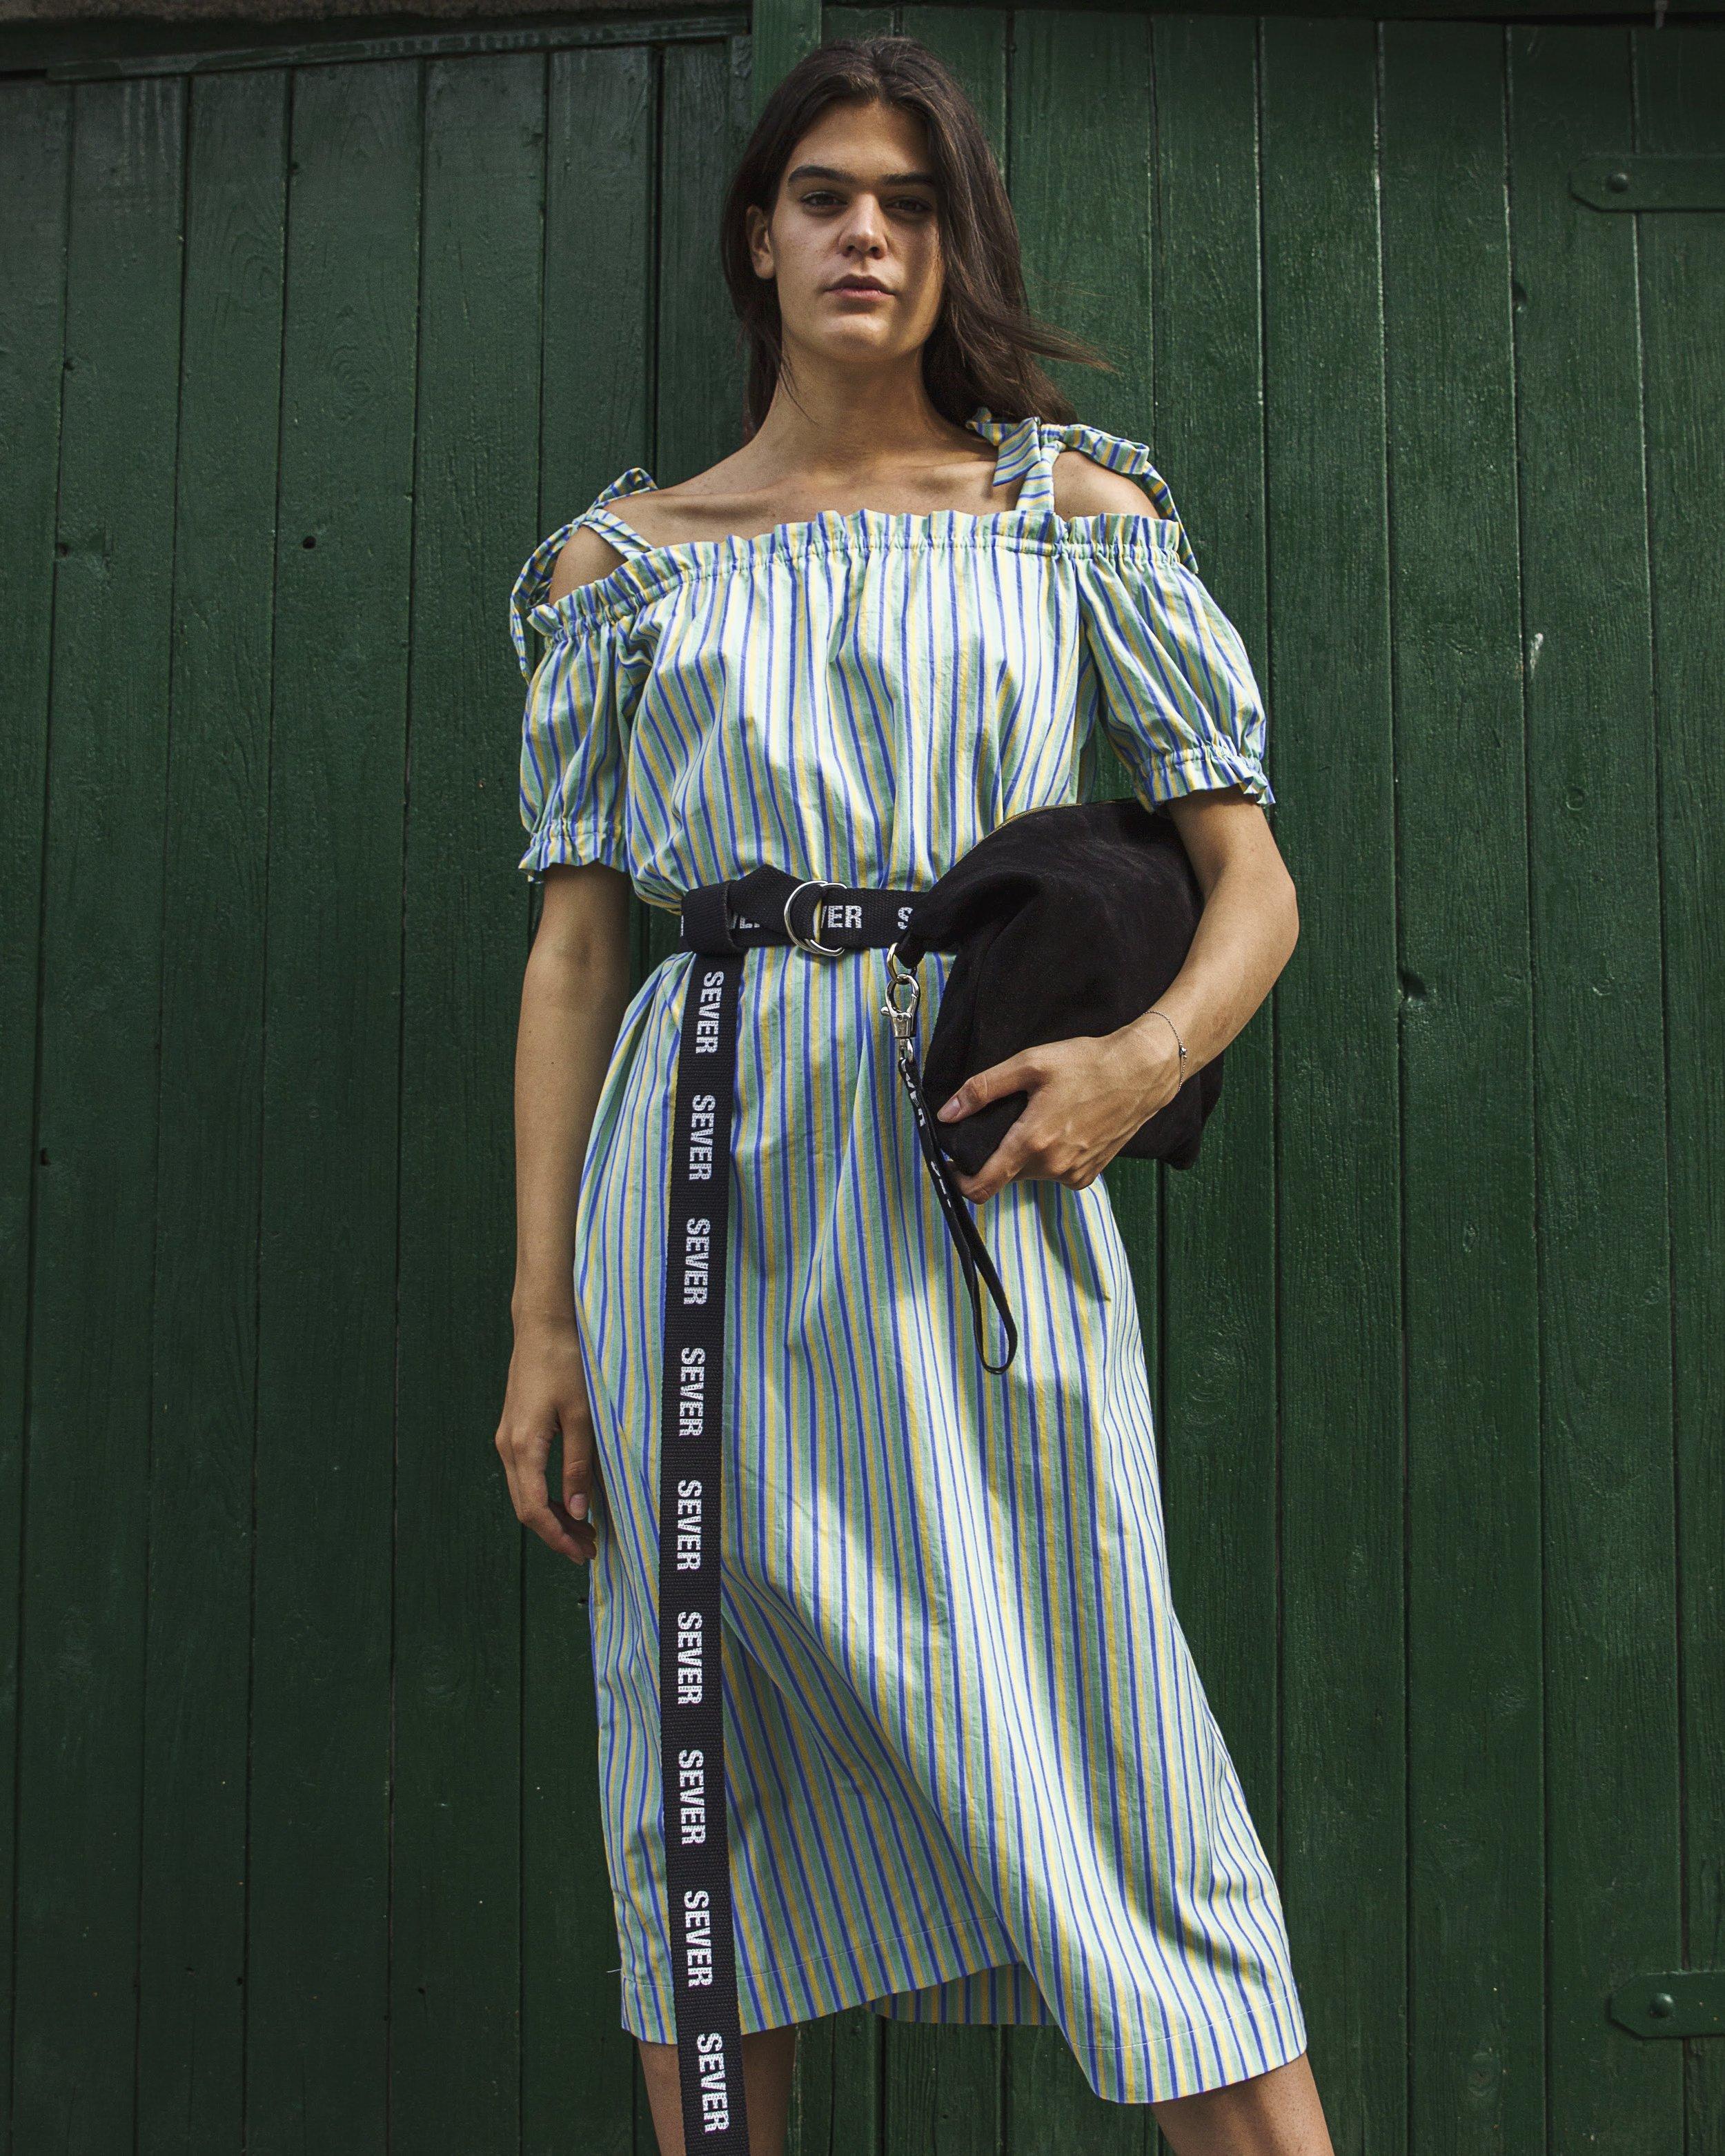 luka-lajic-fashion-photography-robert-sever-dizajner (13).jpg